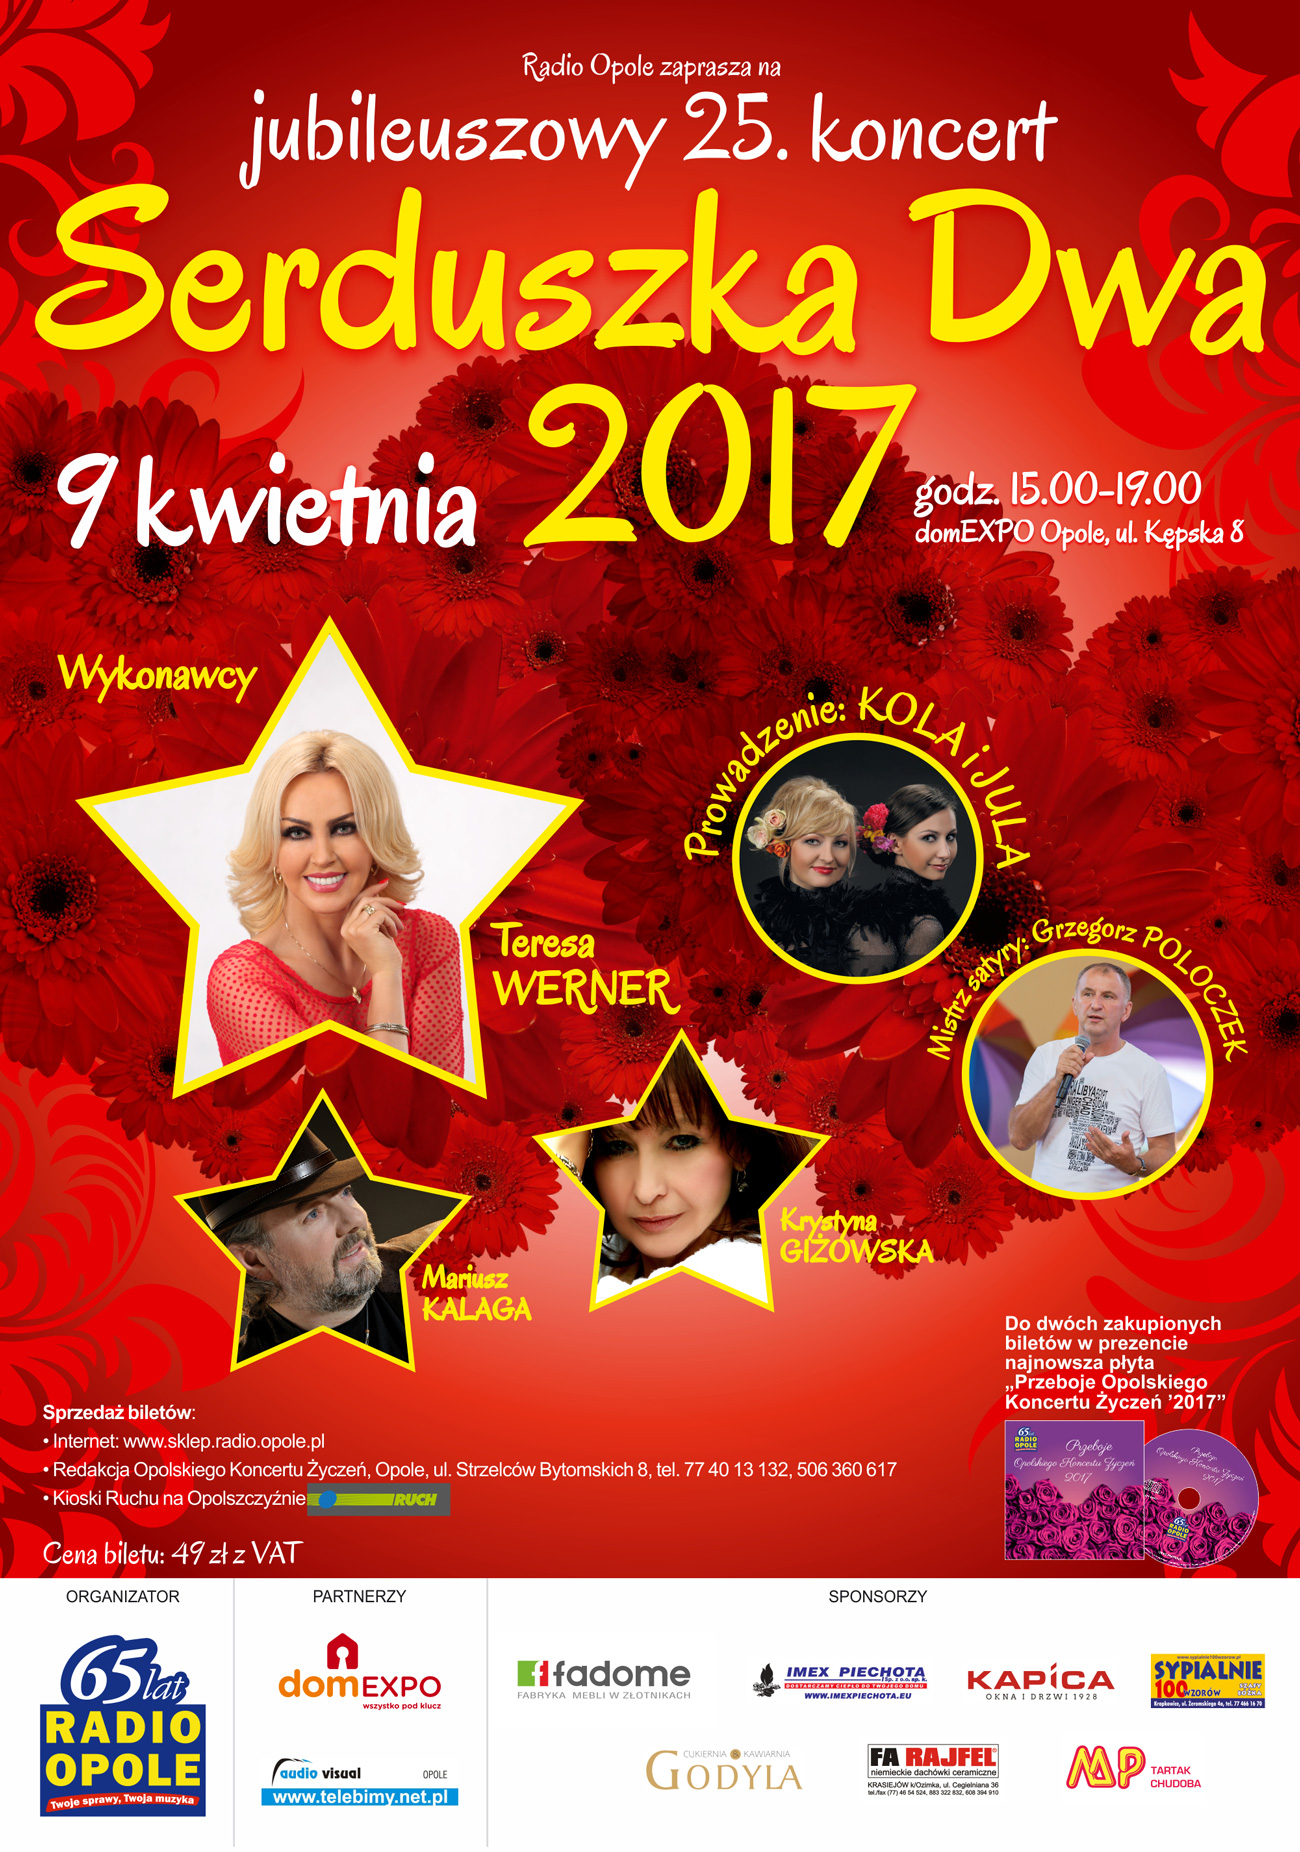 Serduszka Dwa 2017